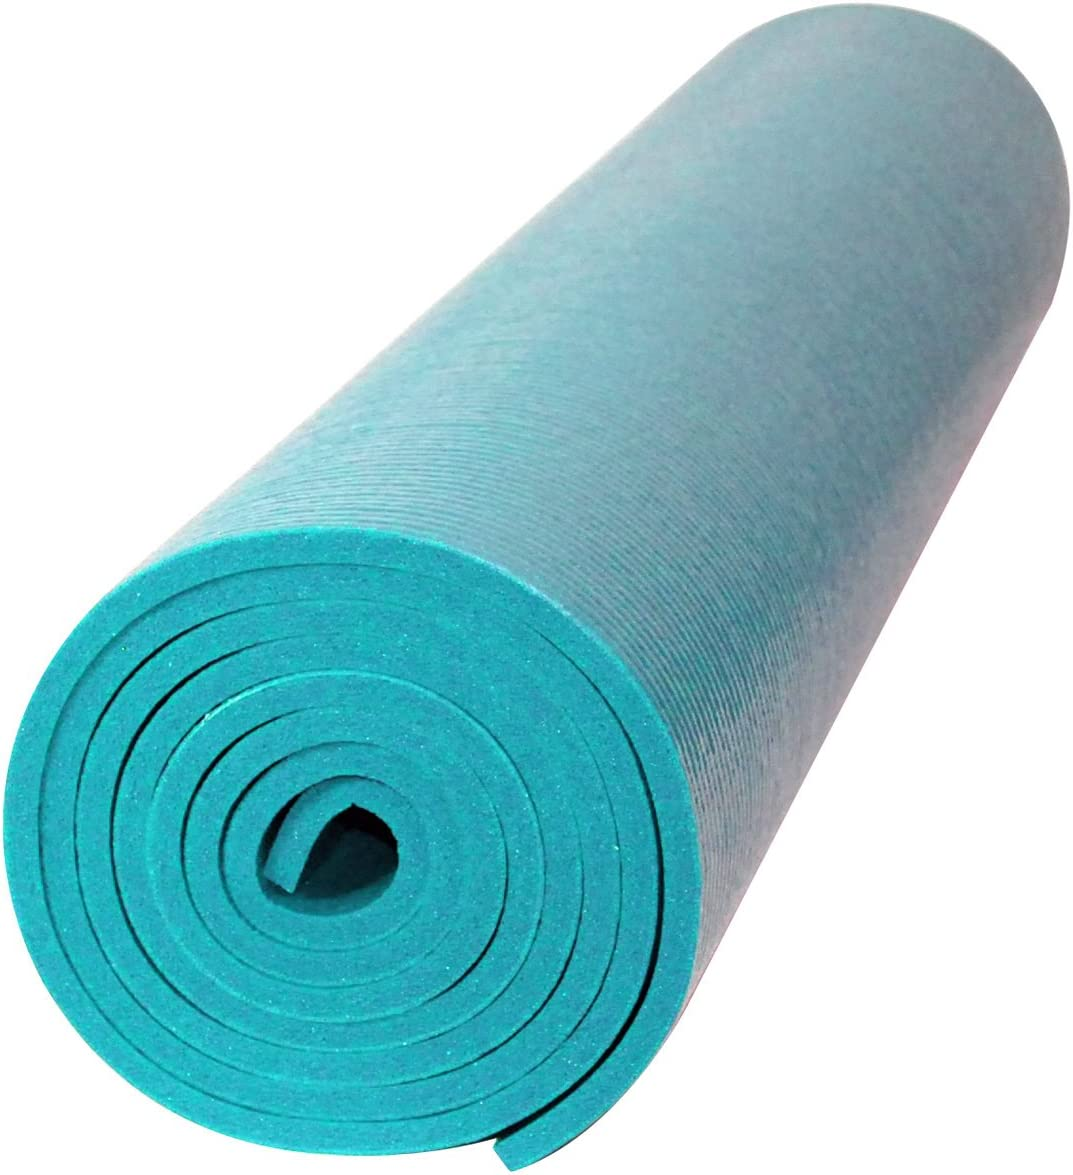 Yoga Direct Mandara Ultra Blue Mat 早割クーポン Premium 直営ストア